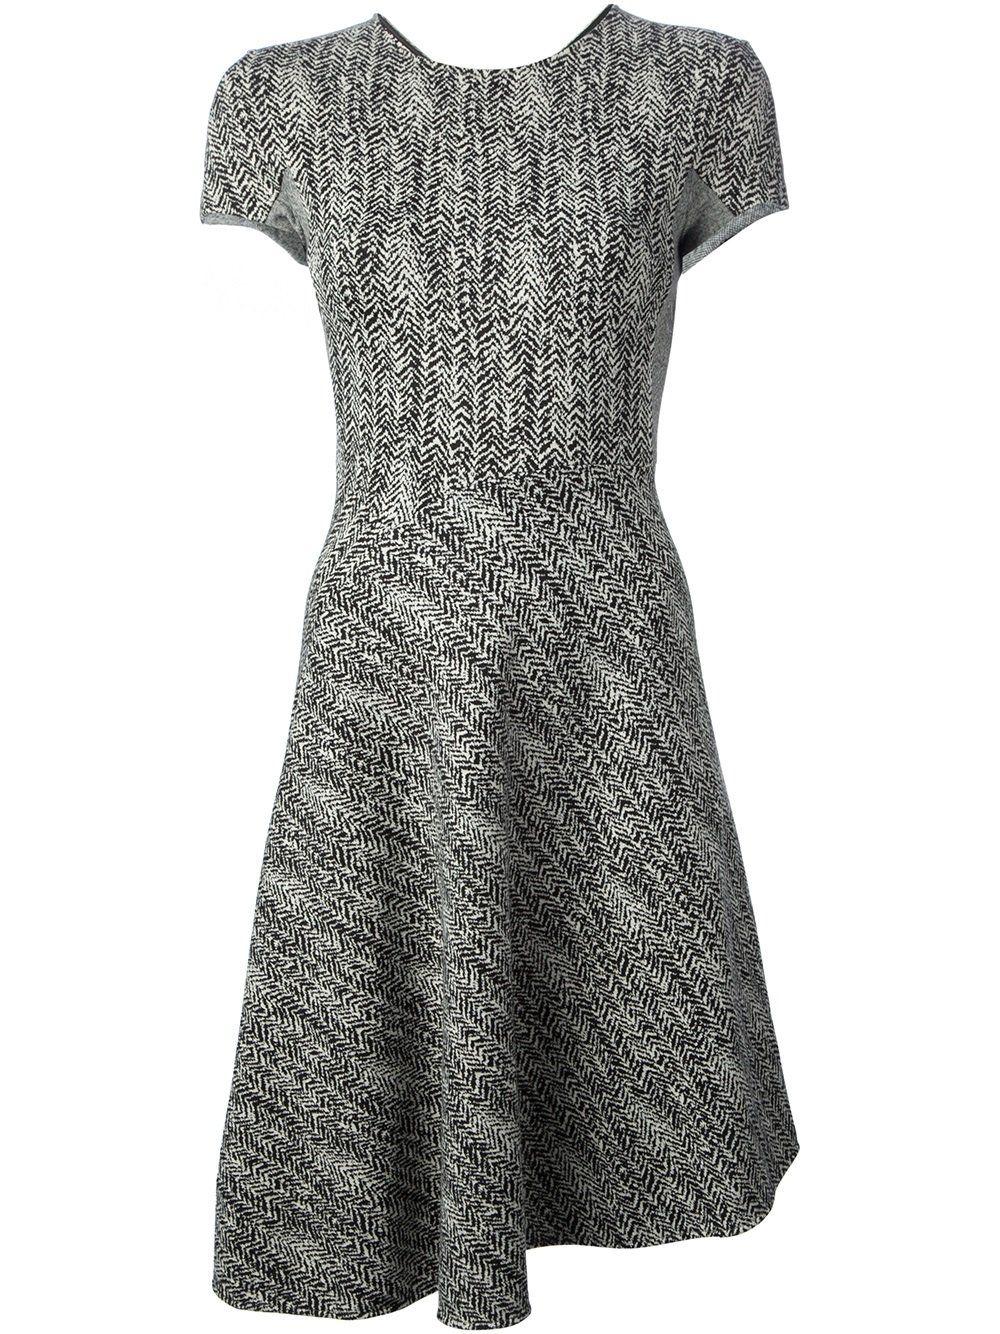 Stella McCartney herringbone tweed dress | šití - šaty (7 ...